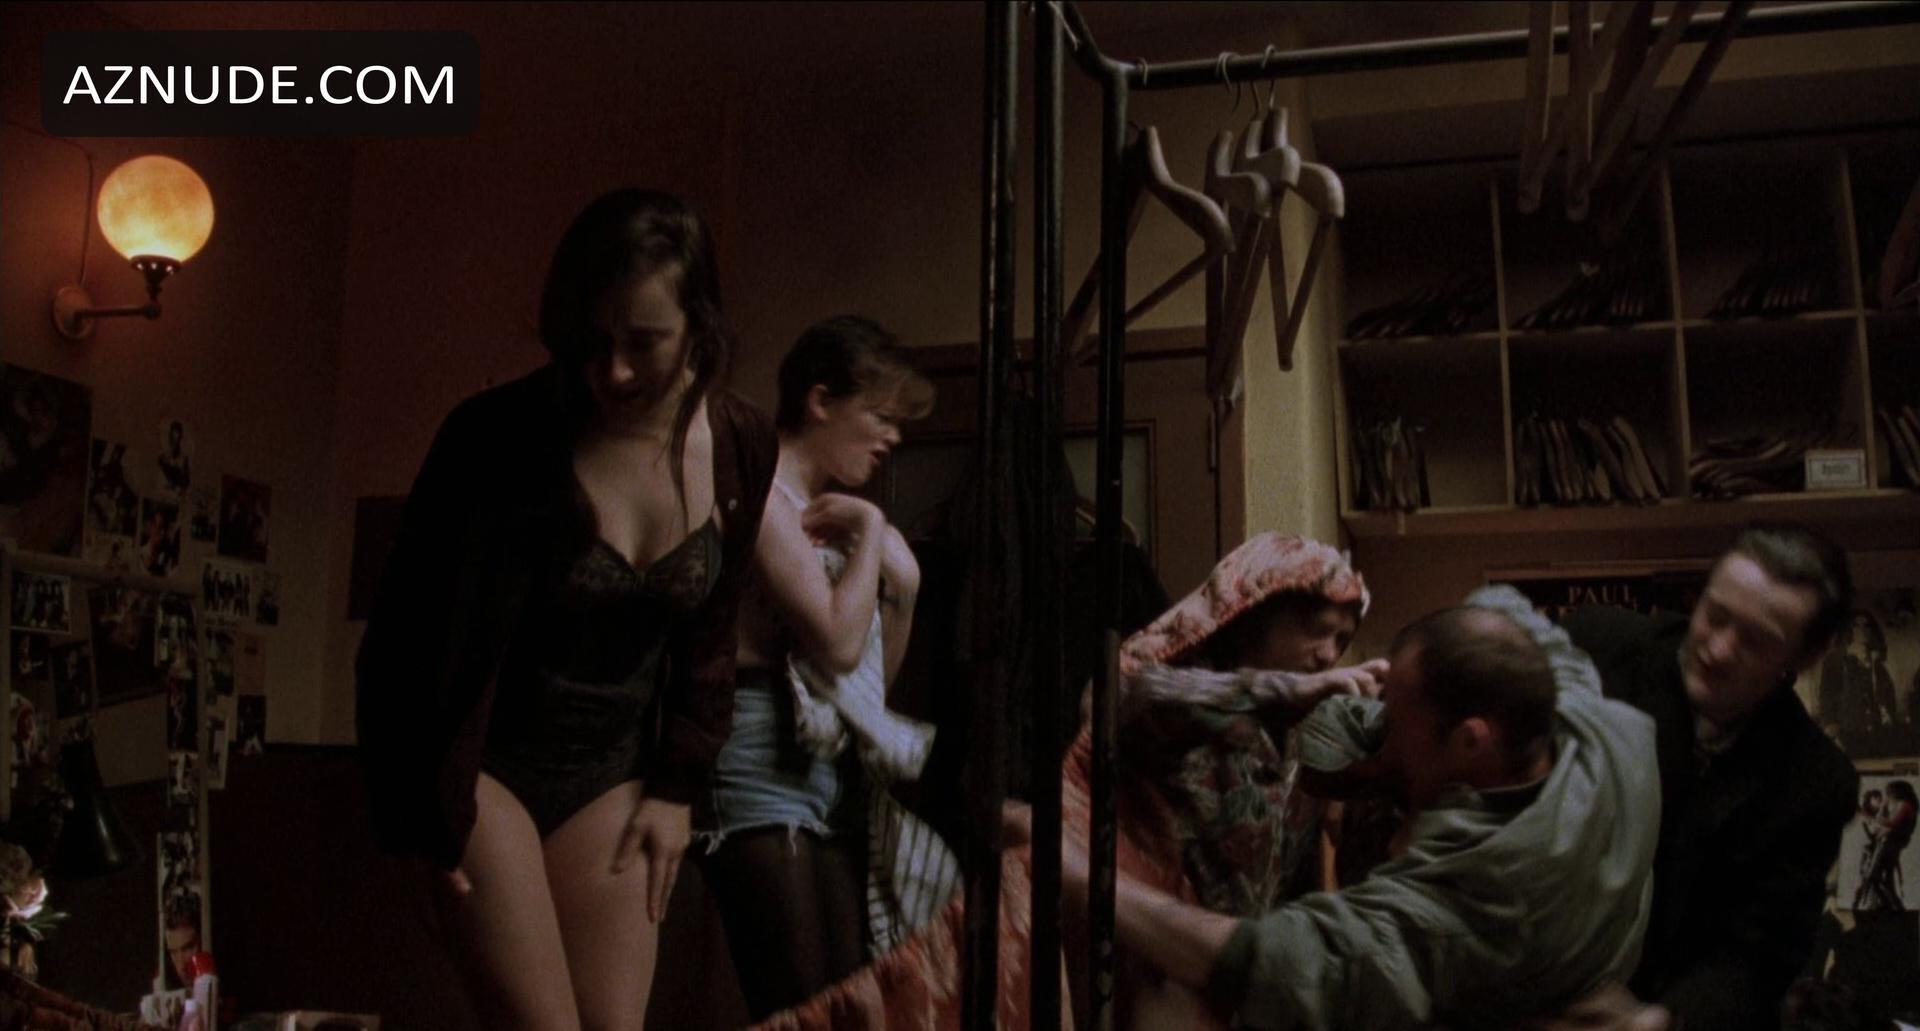 Alexandra Doyle Porn maria doyle kennedy nude - aznude